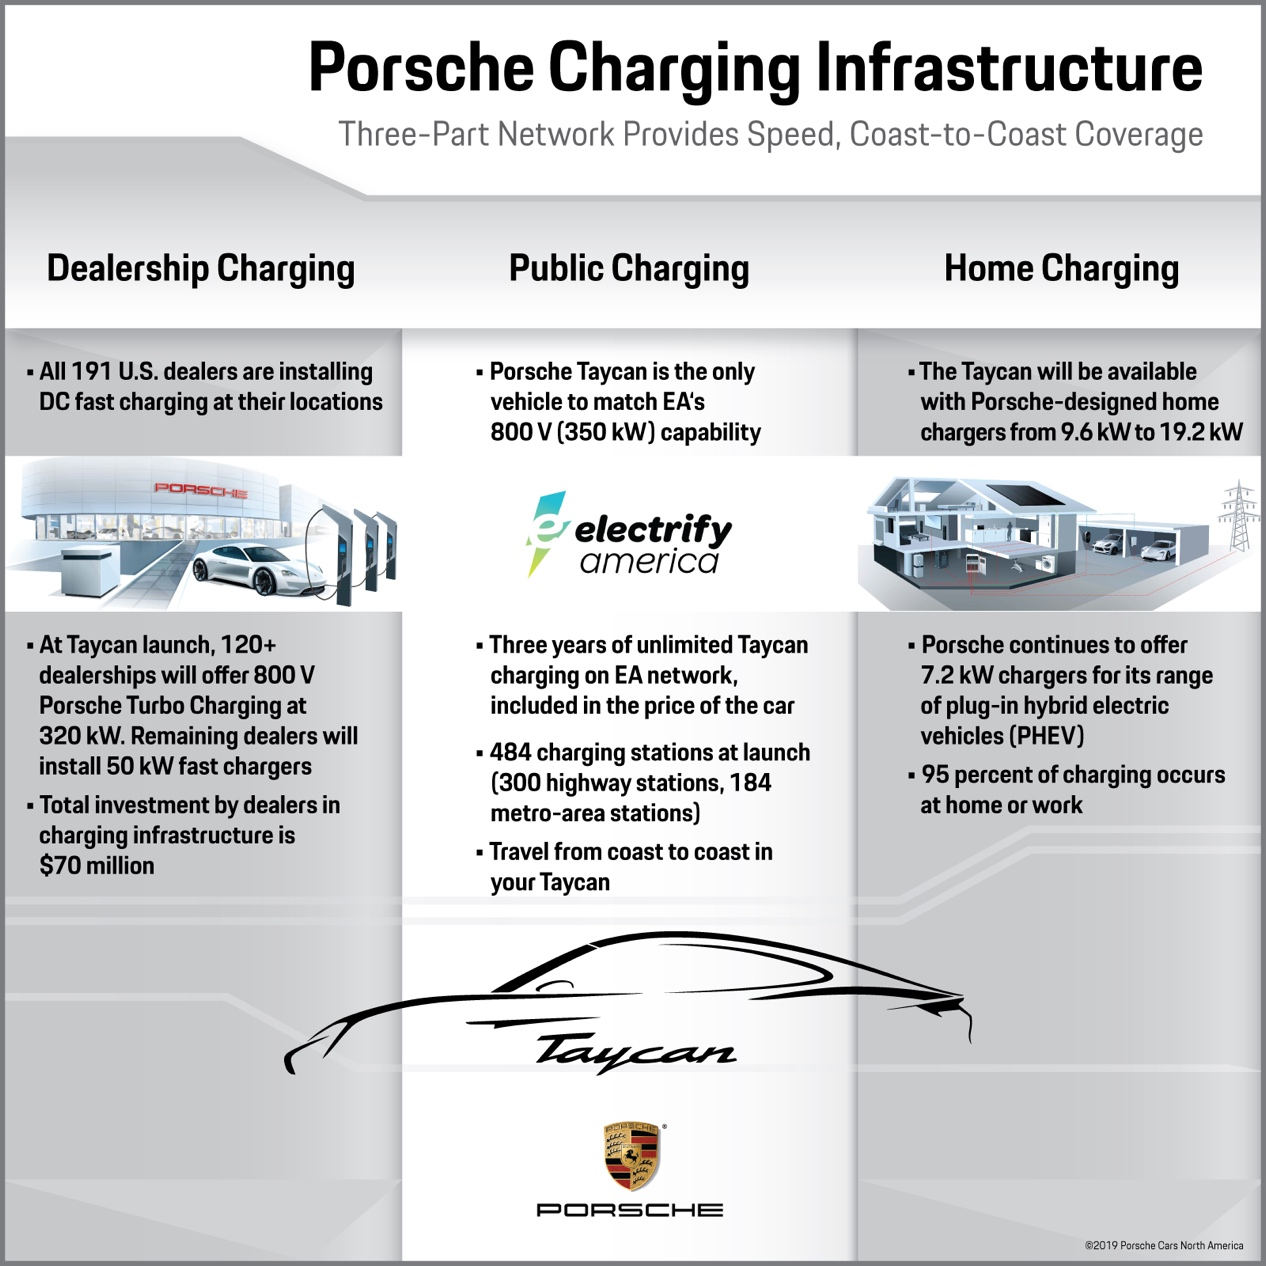 https://cdn.teslarati.com/wp-content/uploads/2019/01/Porsche-charging-infographic.jpg